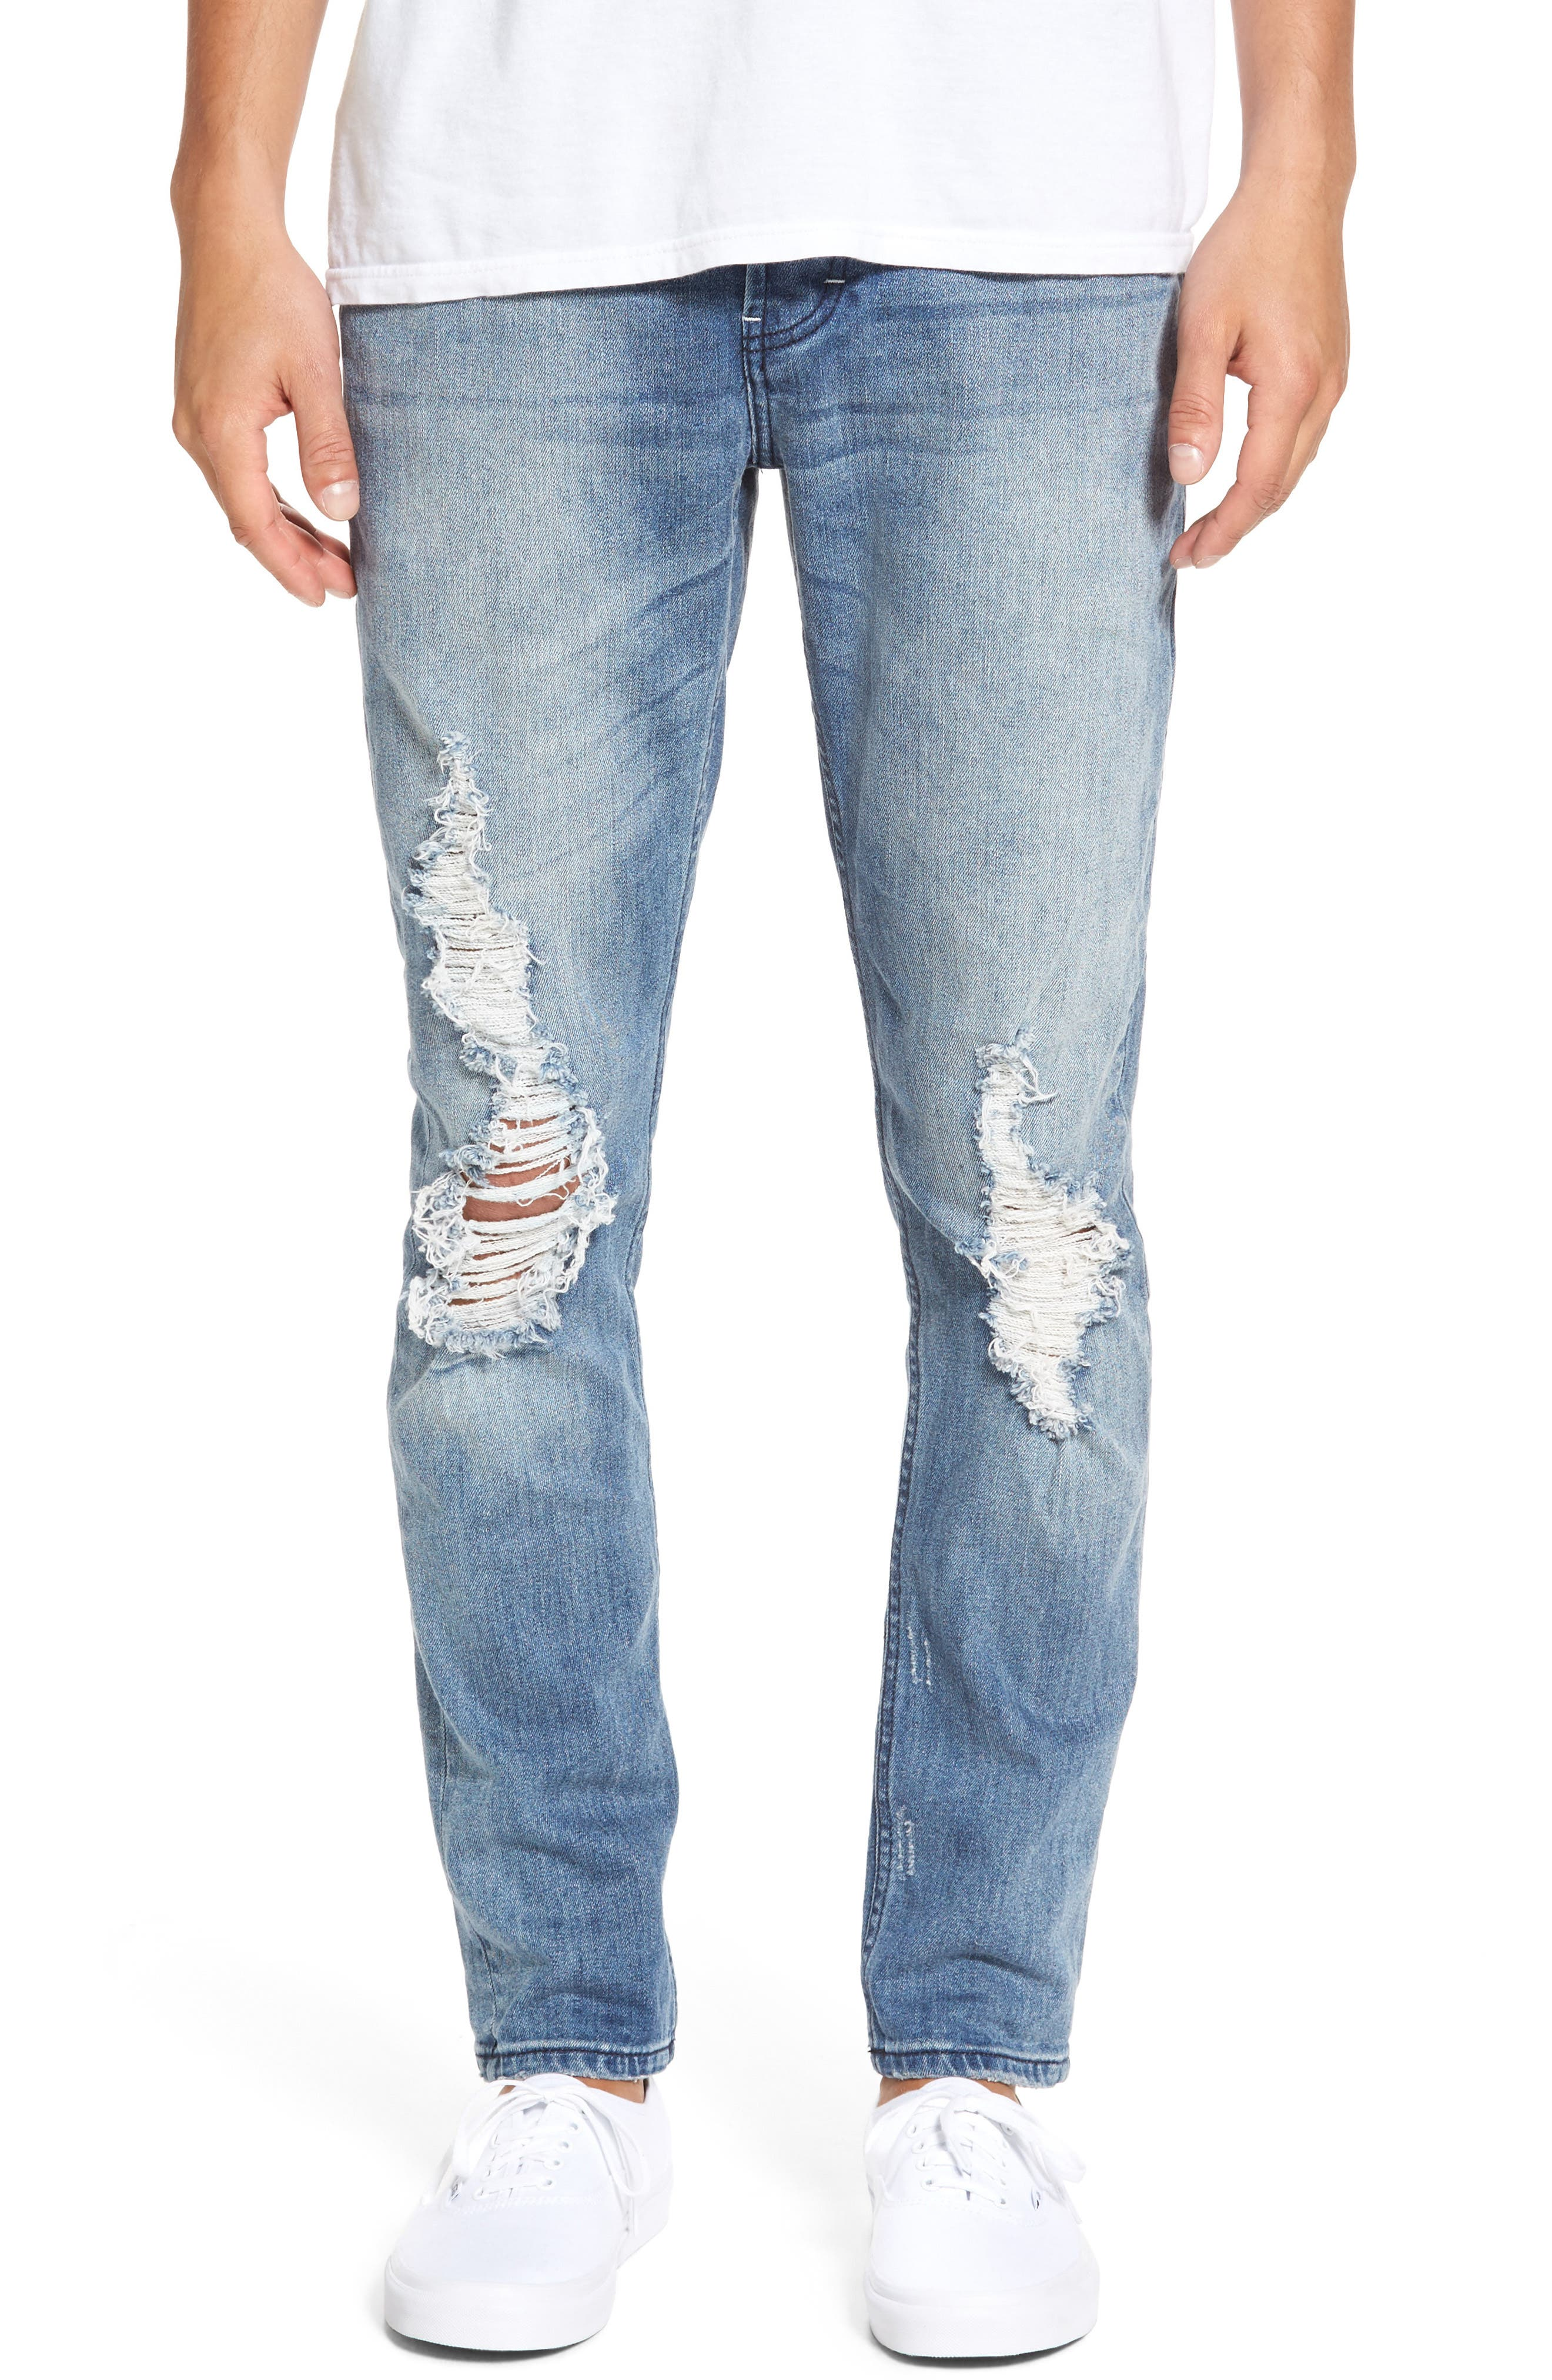 Barney Cools B.Line Slim Fit Jeans (Blow Out Stonewash)